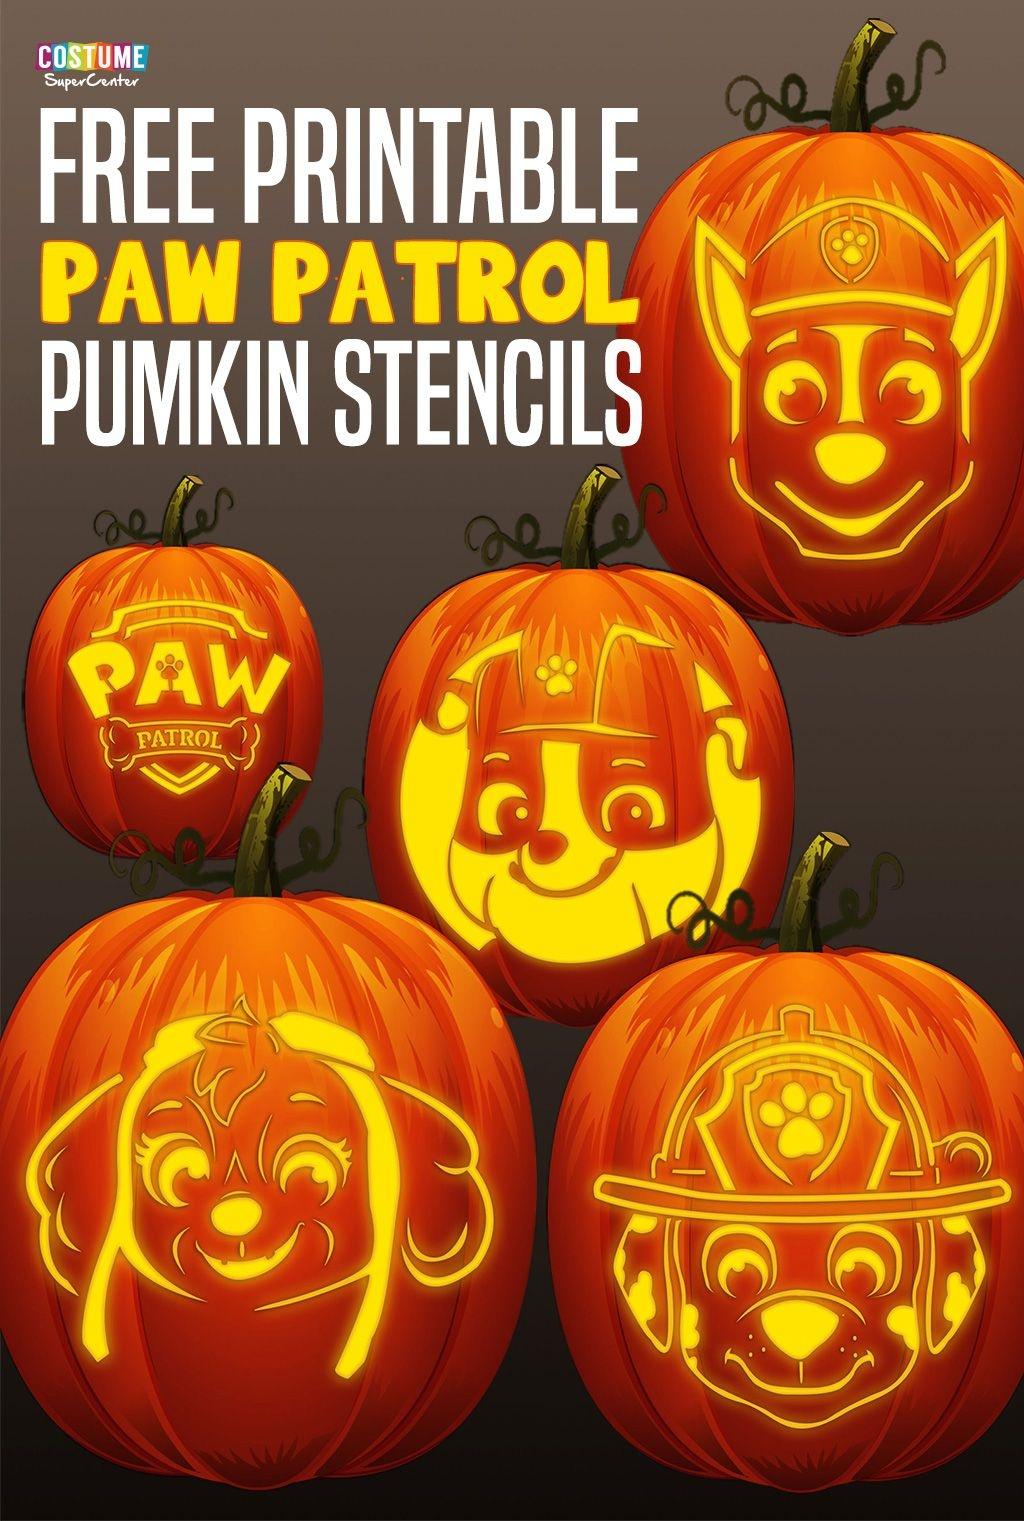 Free Paw Patrol Pumpkin Stencils | Paw Patrol Birthday | Paw Patrol - Halloween Pumpkin Carving Stencils Free Printable